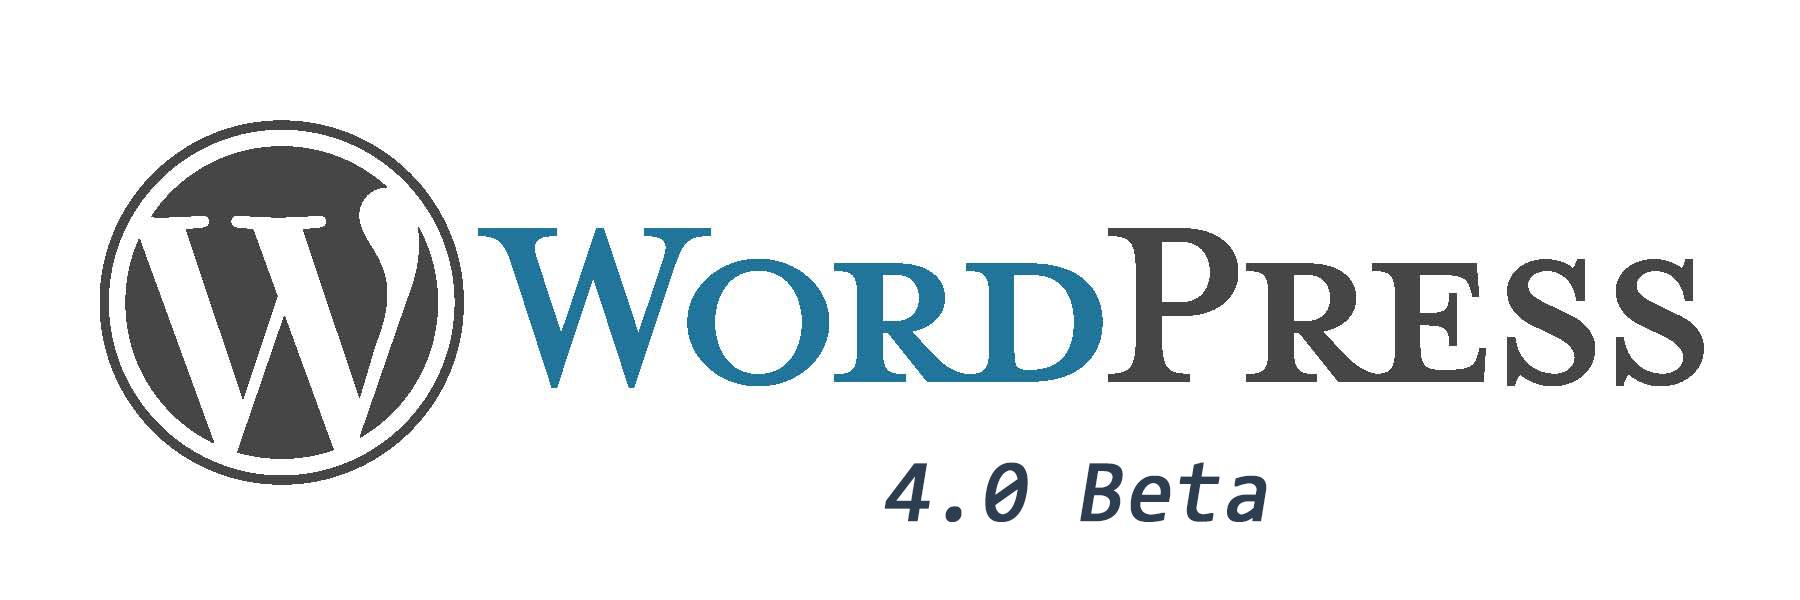 WordPress 4.0 beta